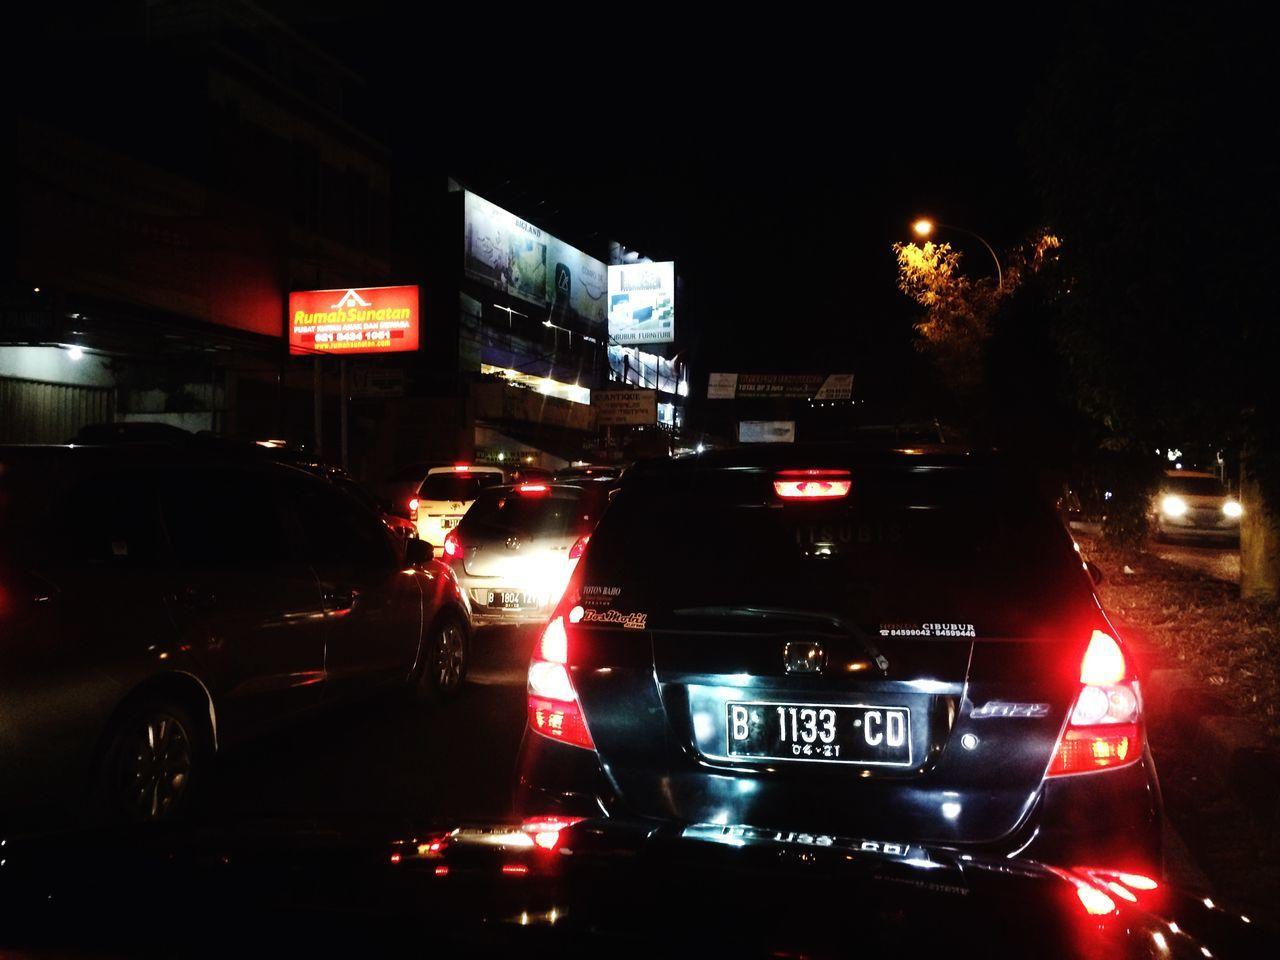 car, illuminated, night, land vehicle, transportation, mode of transport, city, no people, outdoors, architecture